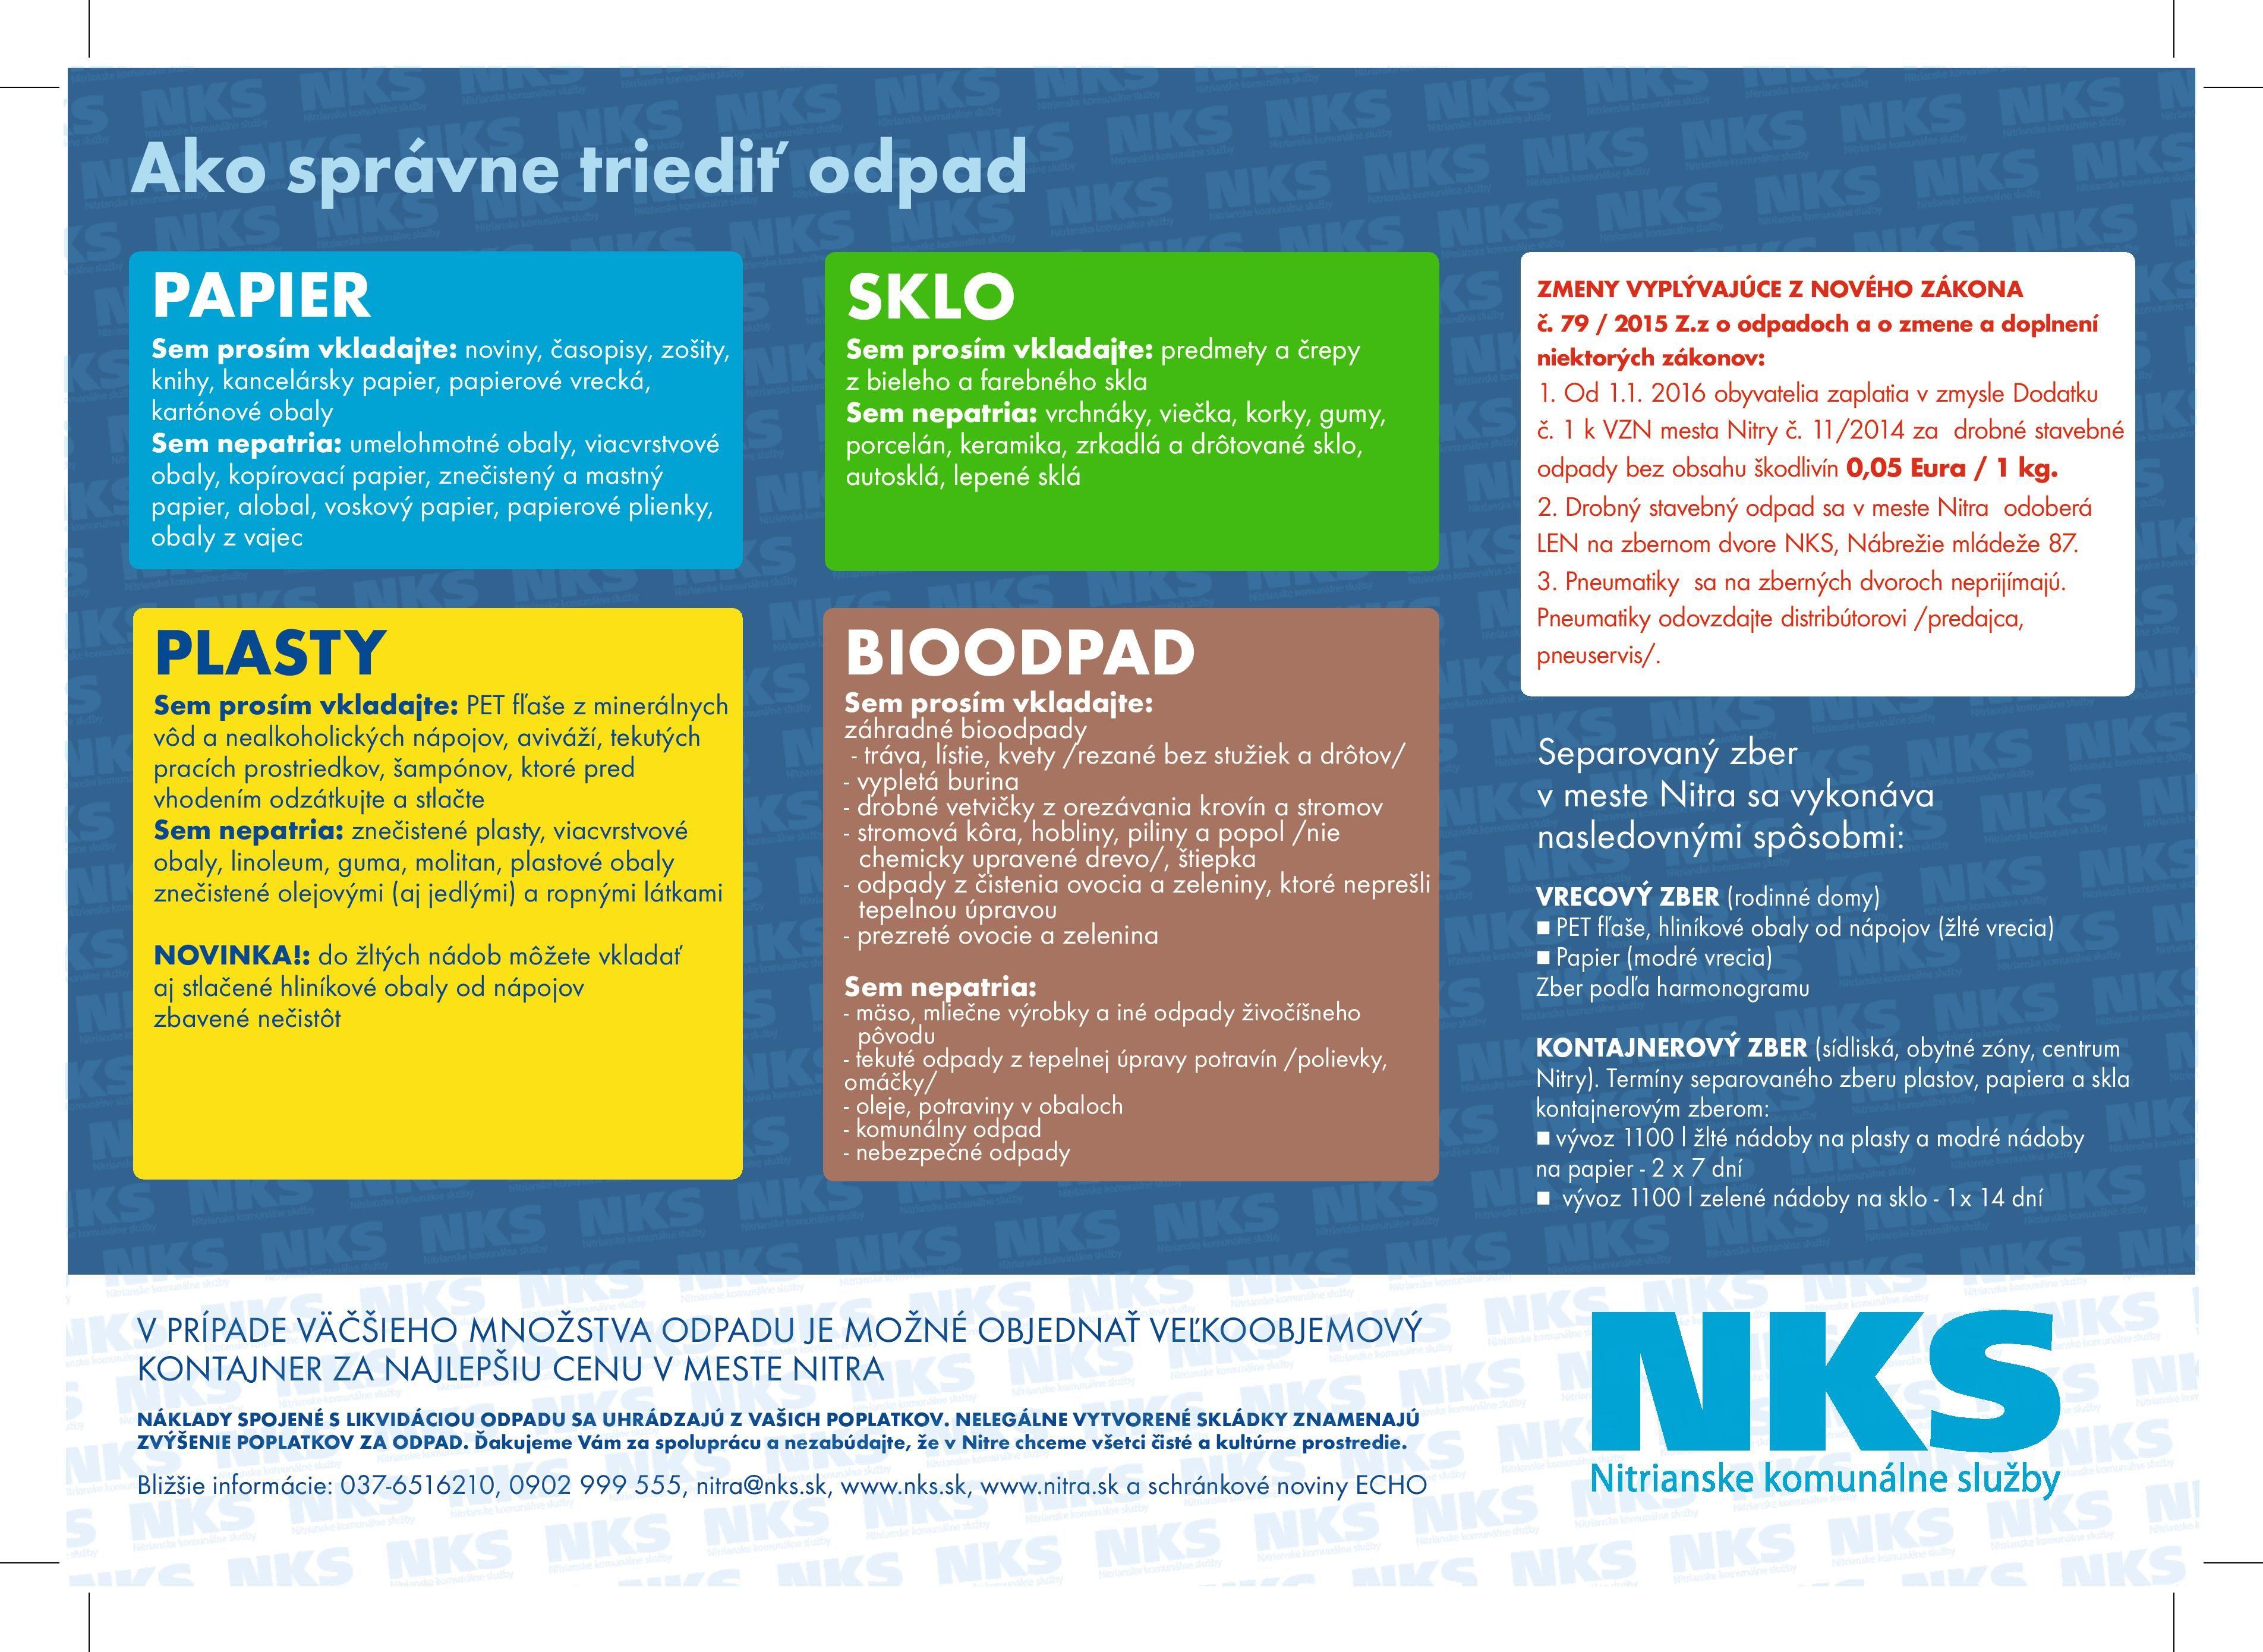 NKS ZBEROVE DVORY LETAK FINAL 2016-page-002